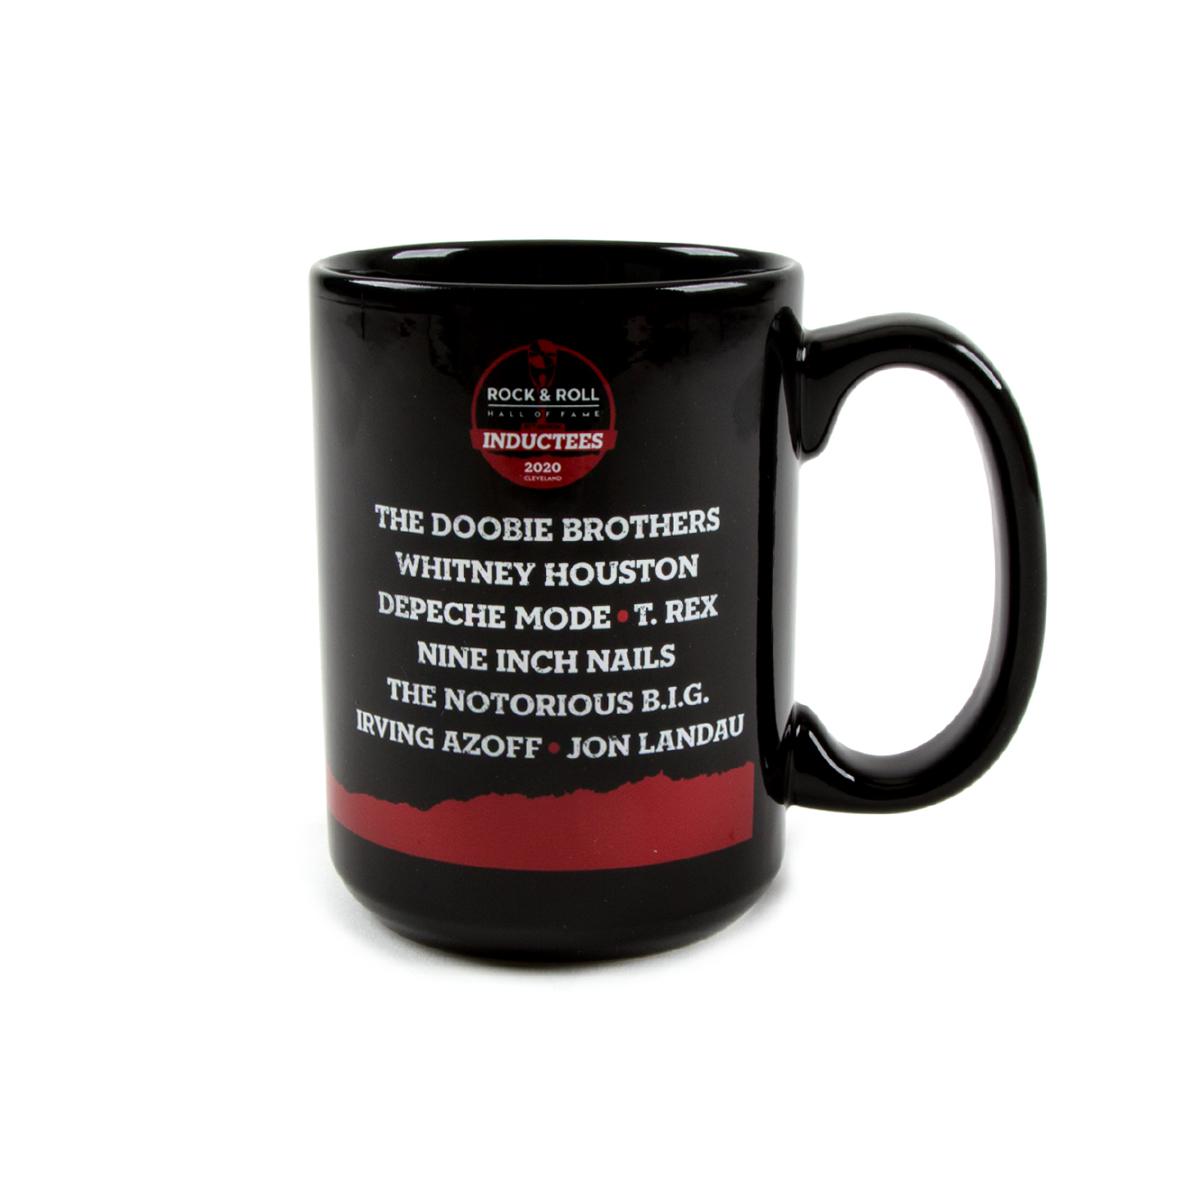 2020 Inductee Mug